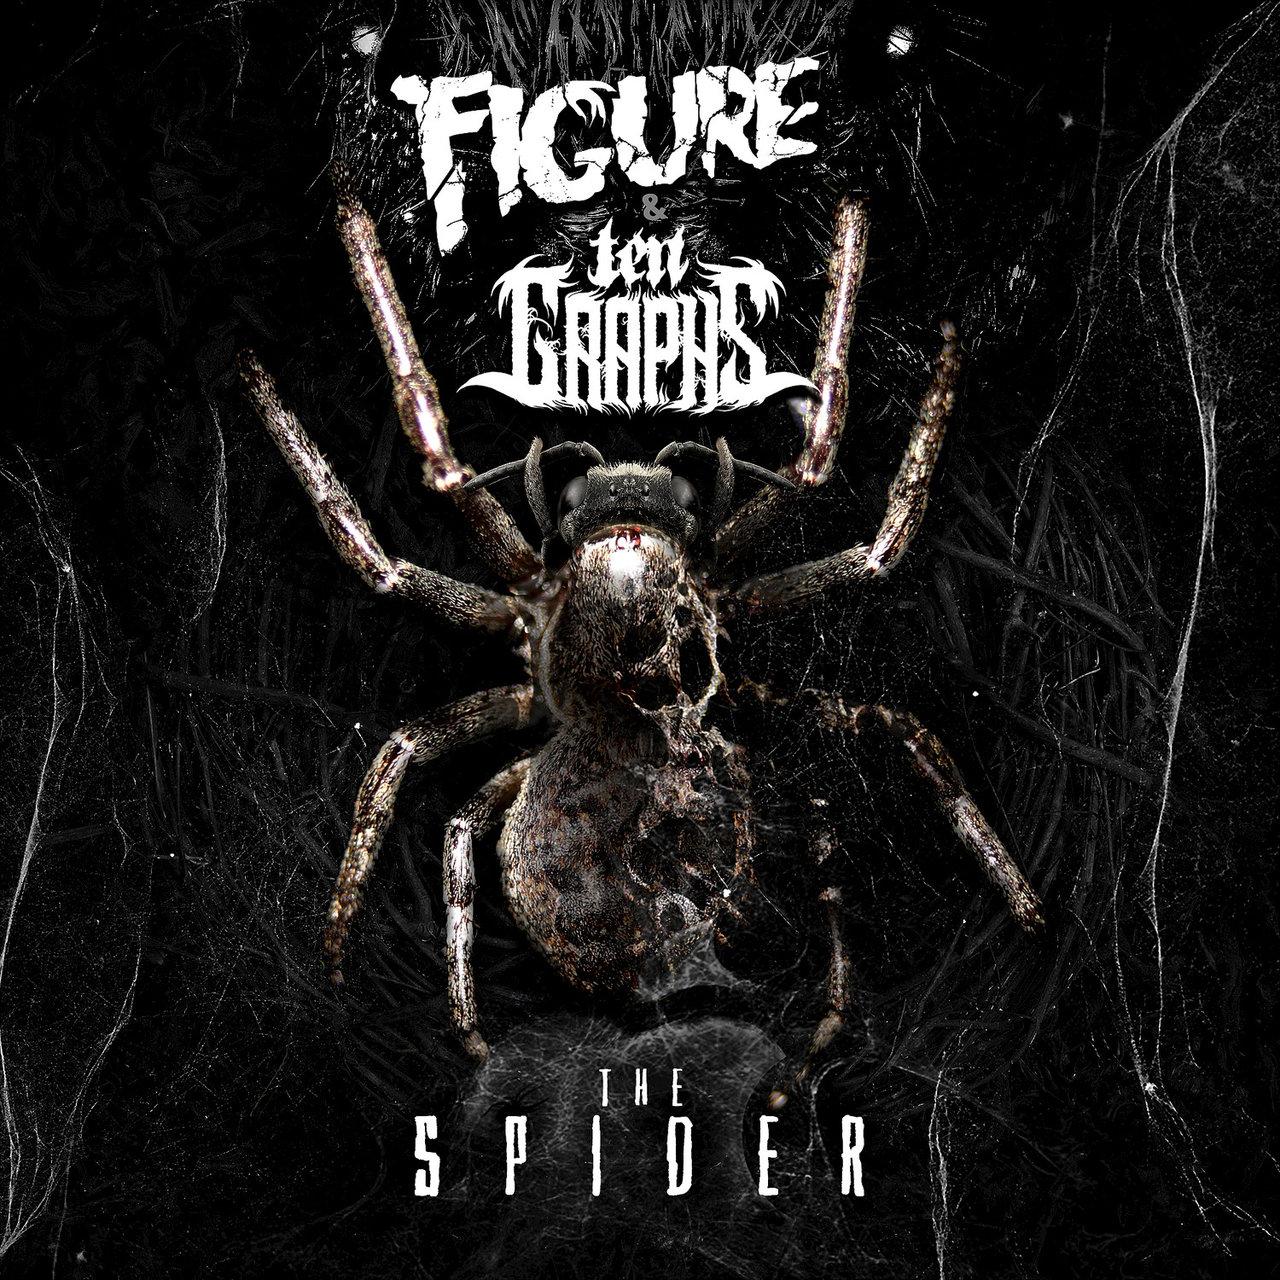 Tidal Listen To Tengraphs On Tekaaa The Spider